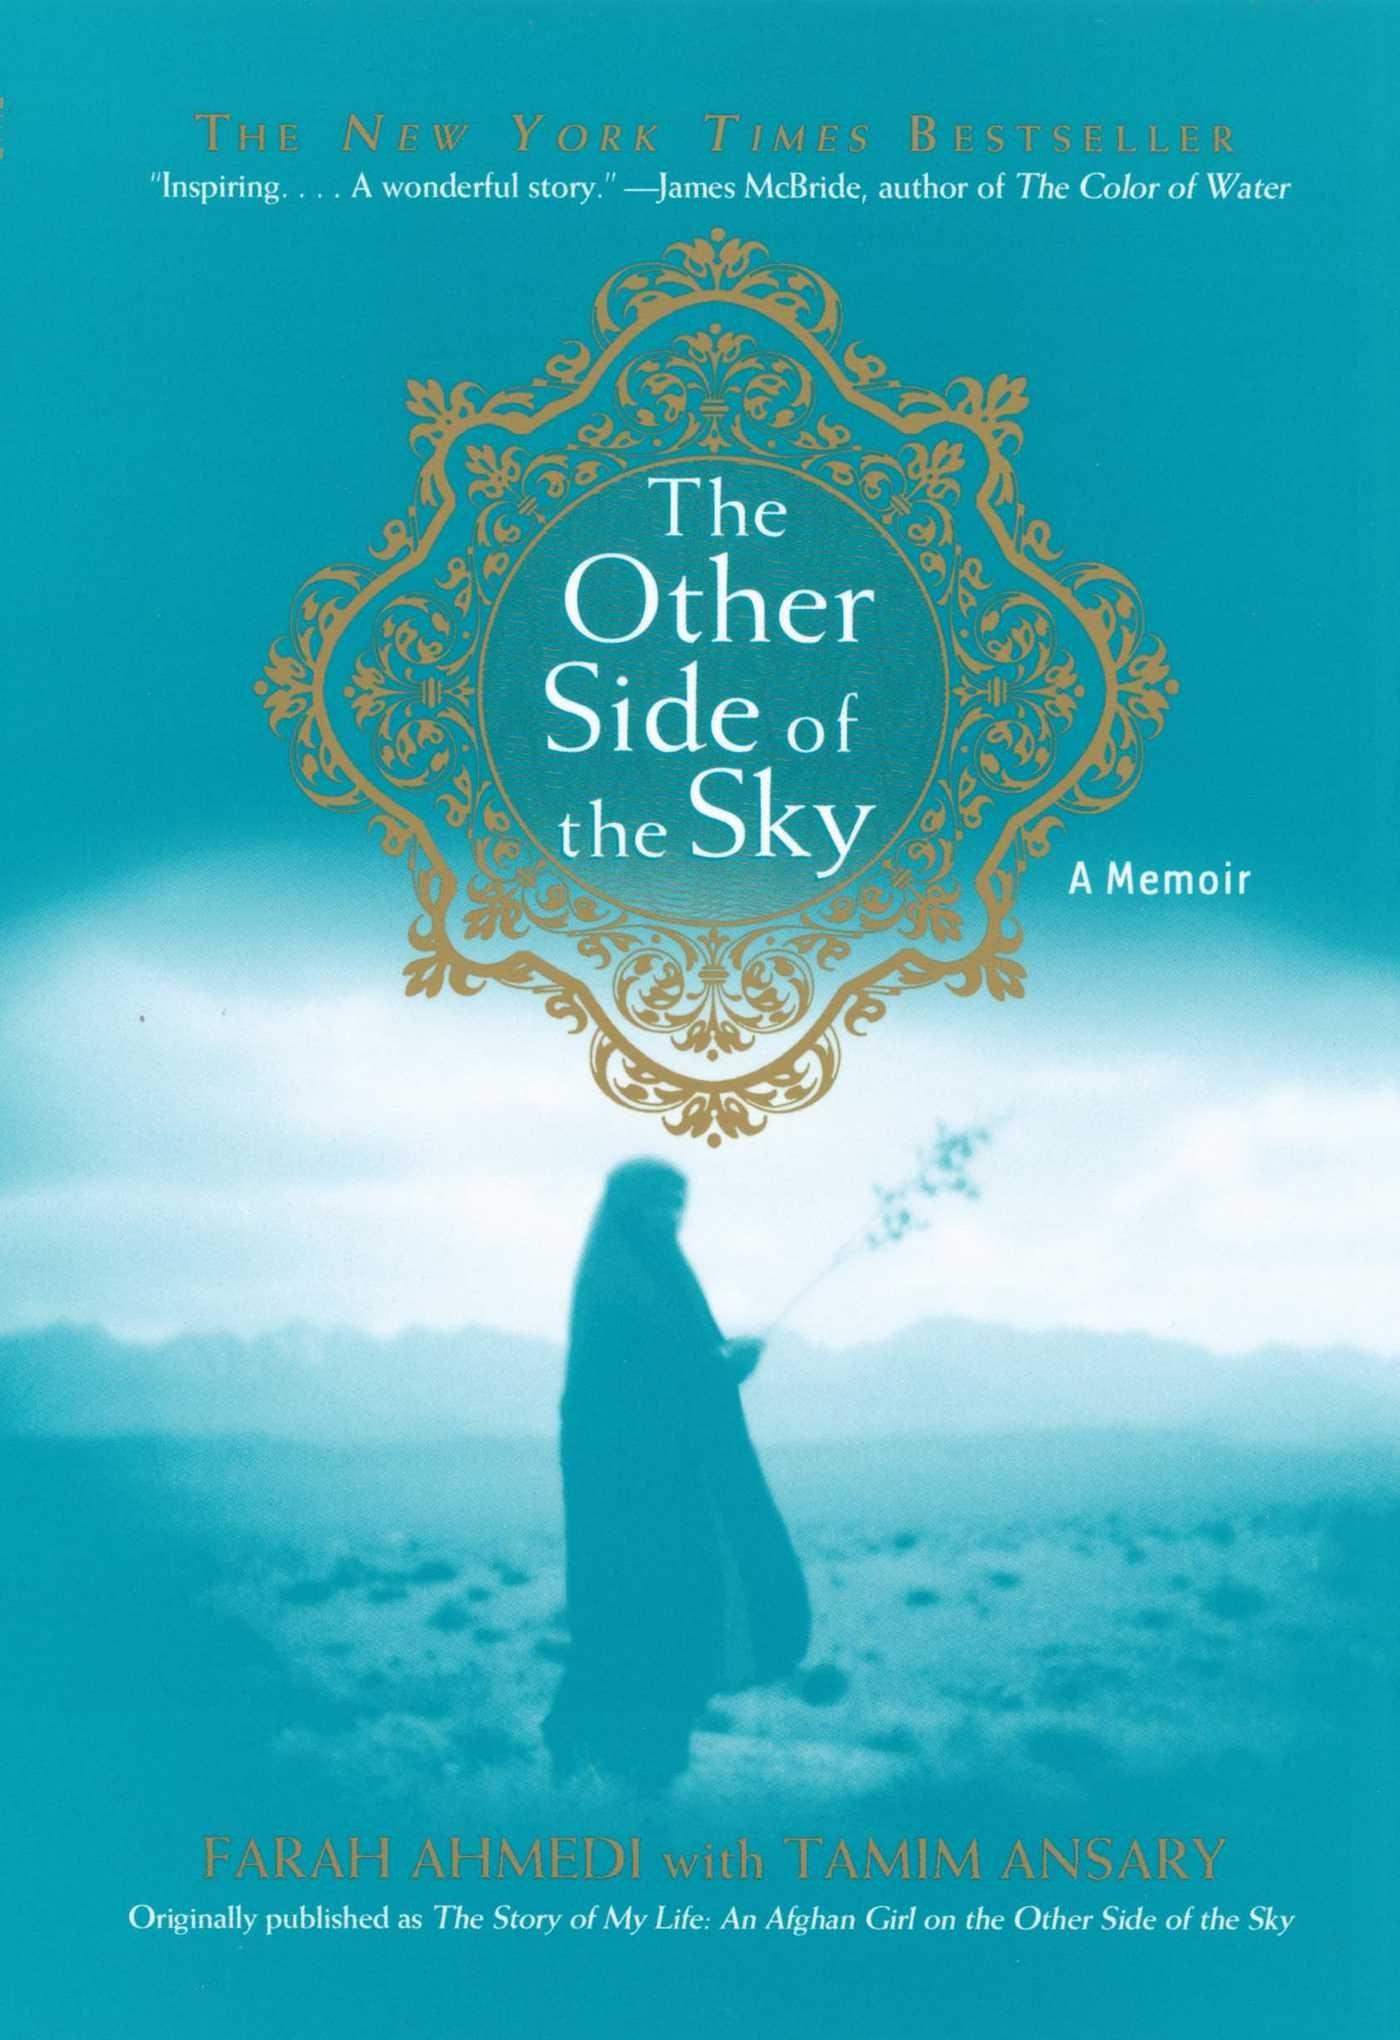 The other side of the sky a memoir farah ahmedi tamim ansary the other side of the sky a memoir farah ahmedi tamim ansary 9781416918370 amazon books fandeluxe Choice Image